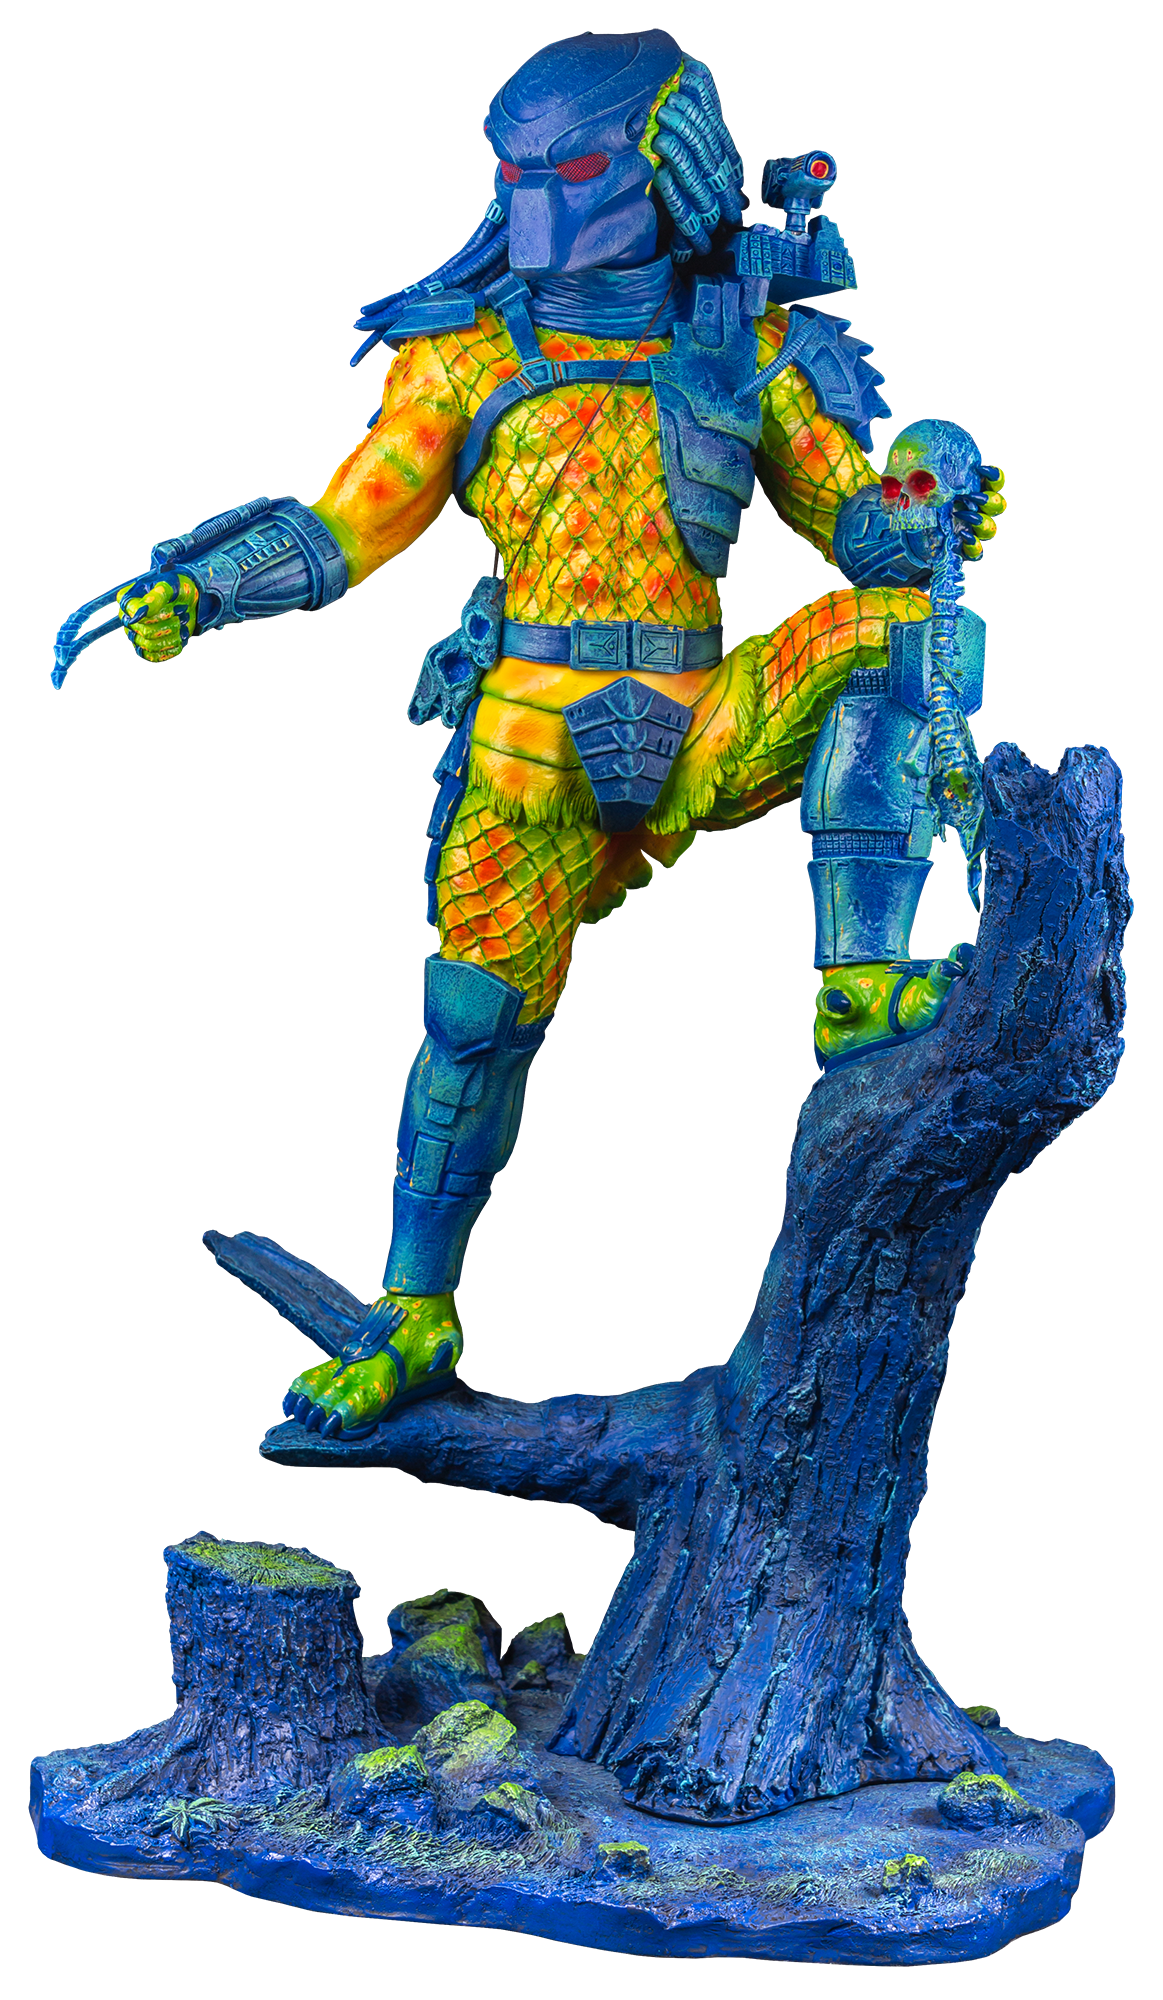 IKO1571-Thermal-Vision-Predator-Statue-POPCULTCHA-EXCLUSIVE-7.png